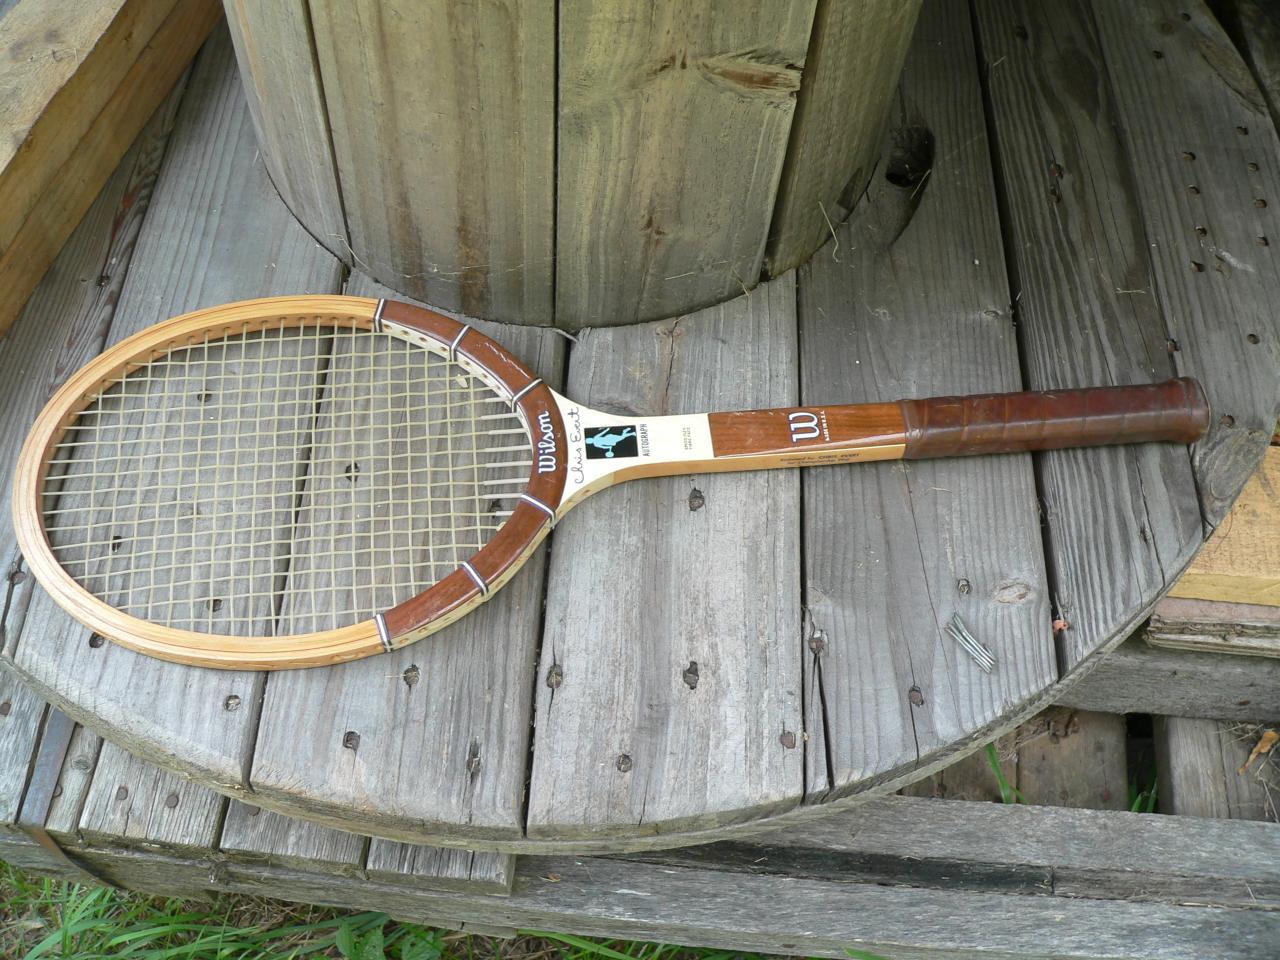 Raquette de tennis # 3204.2